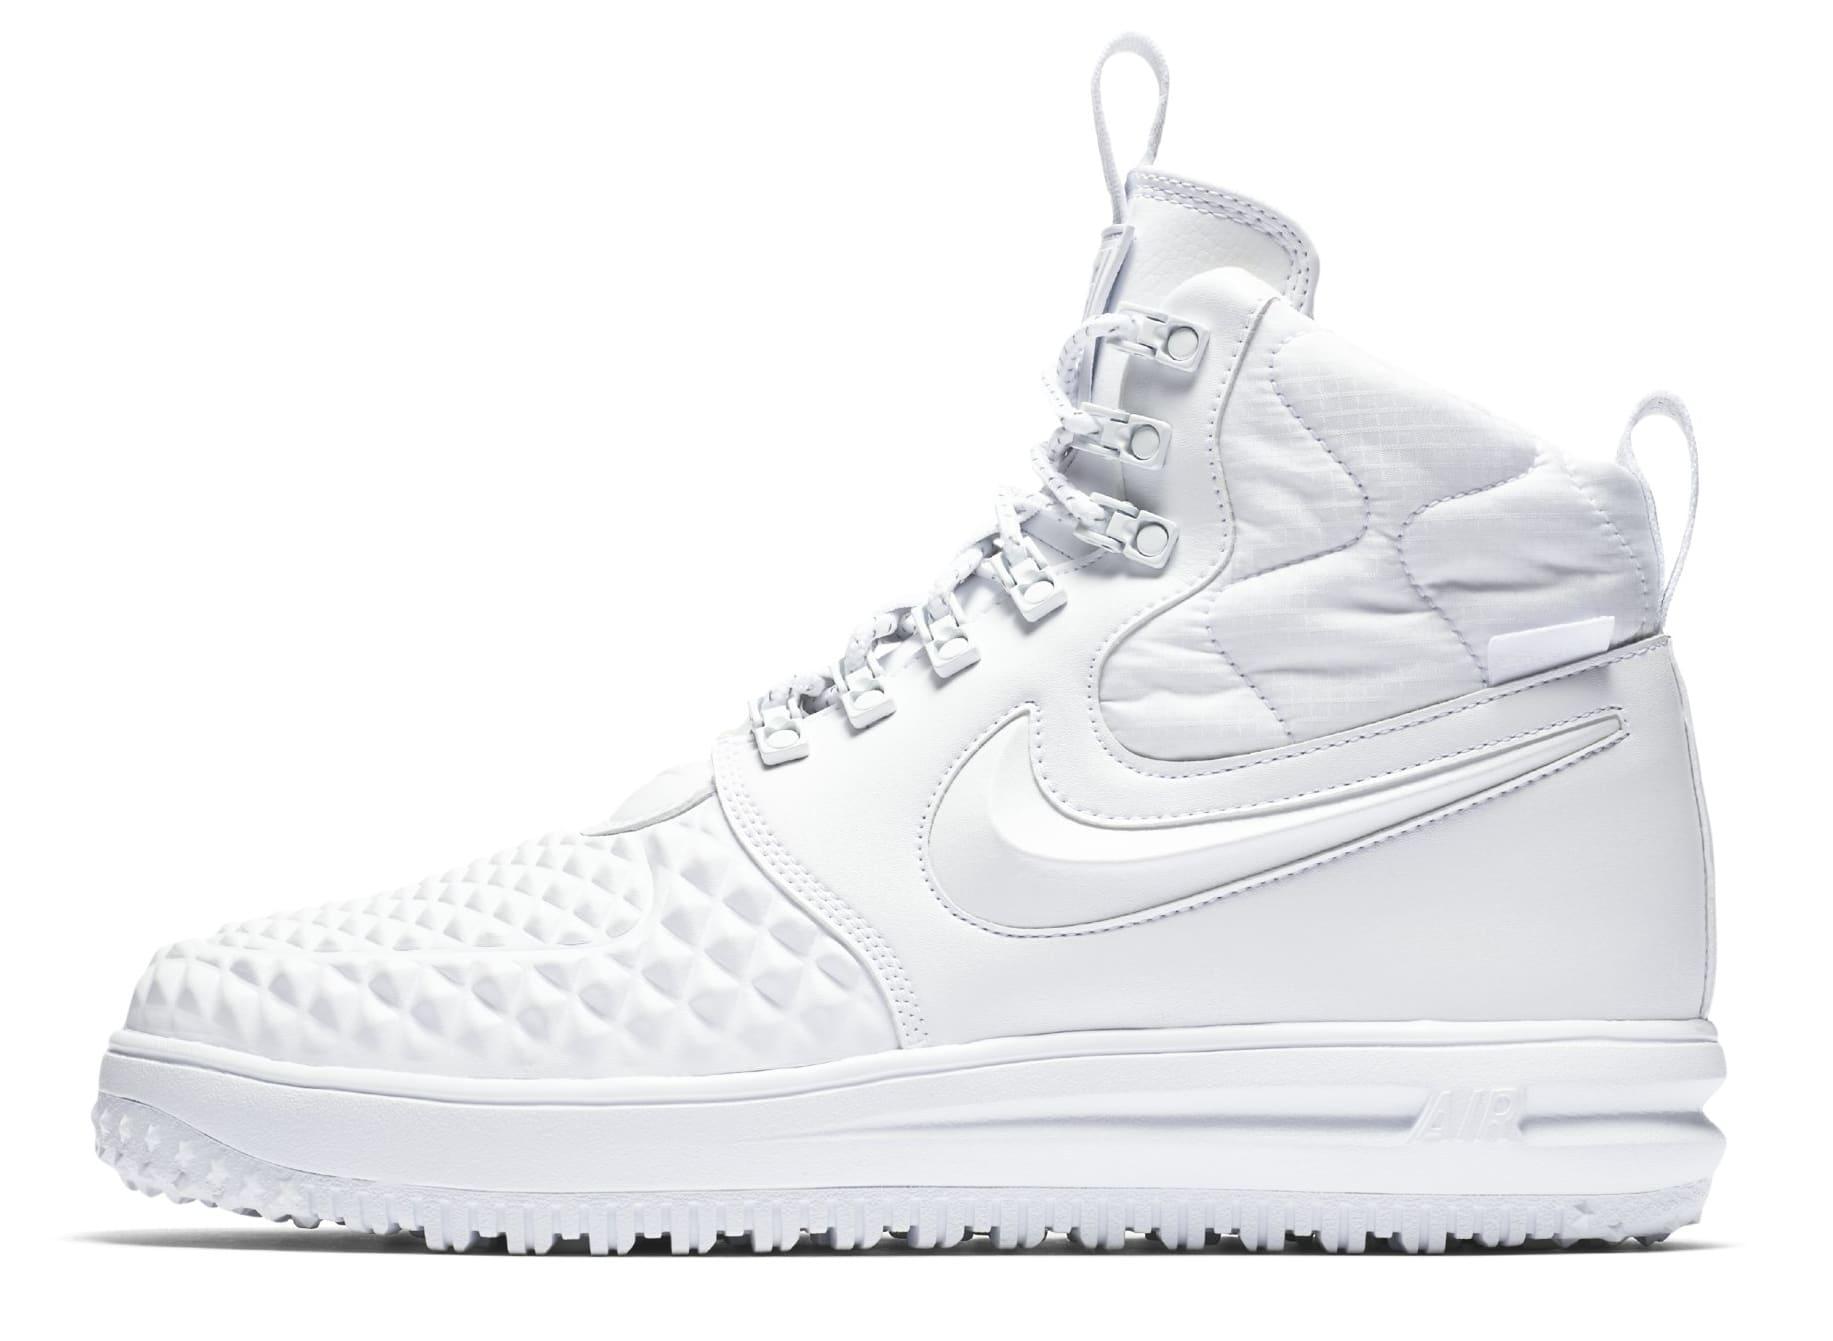 Nike AF1 High Winterized